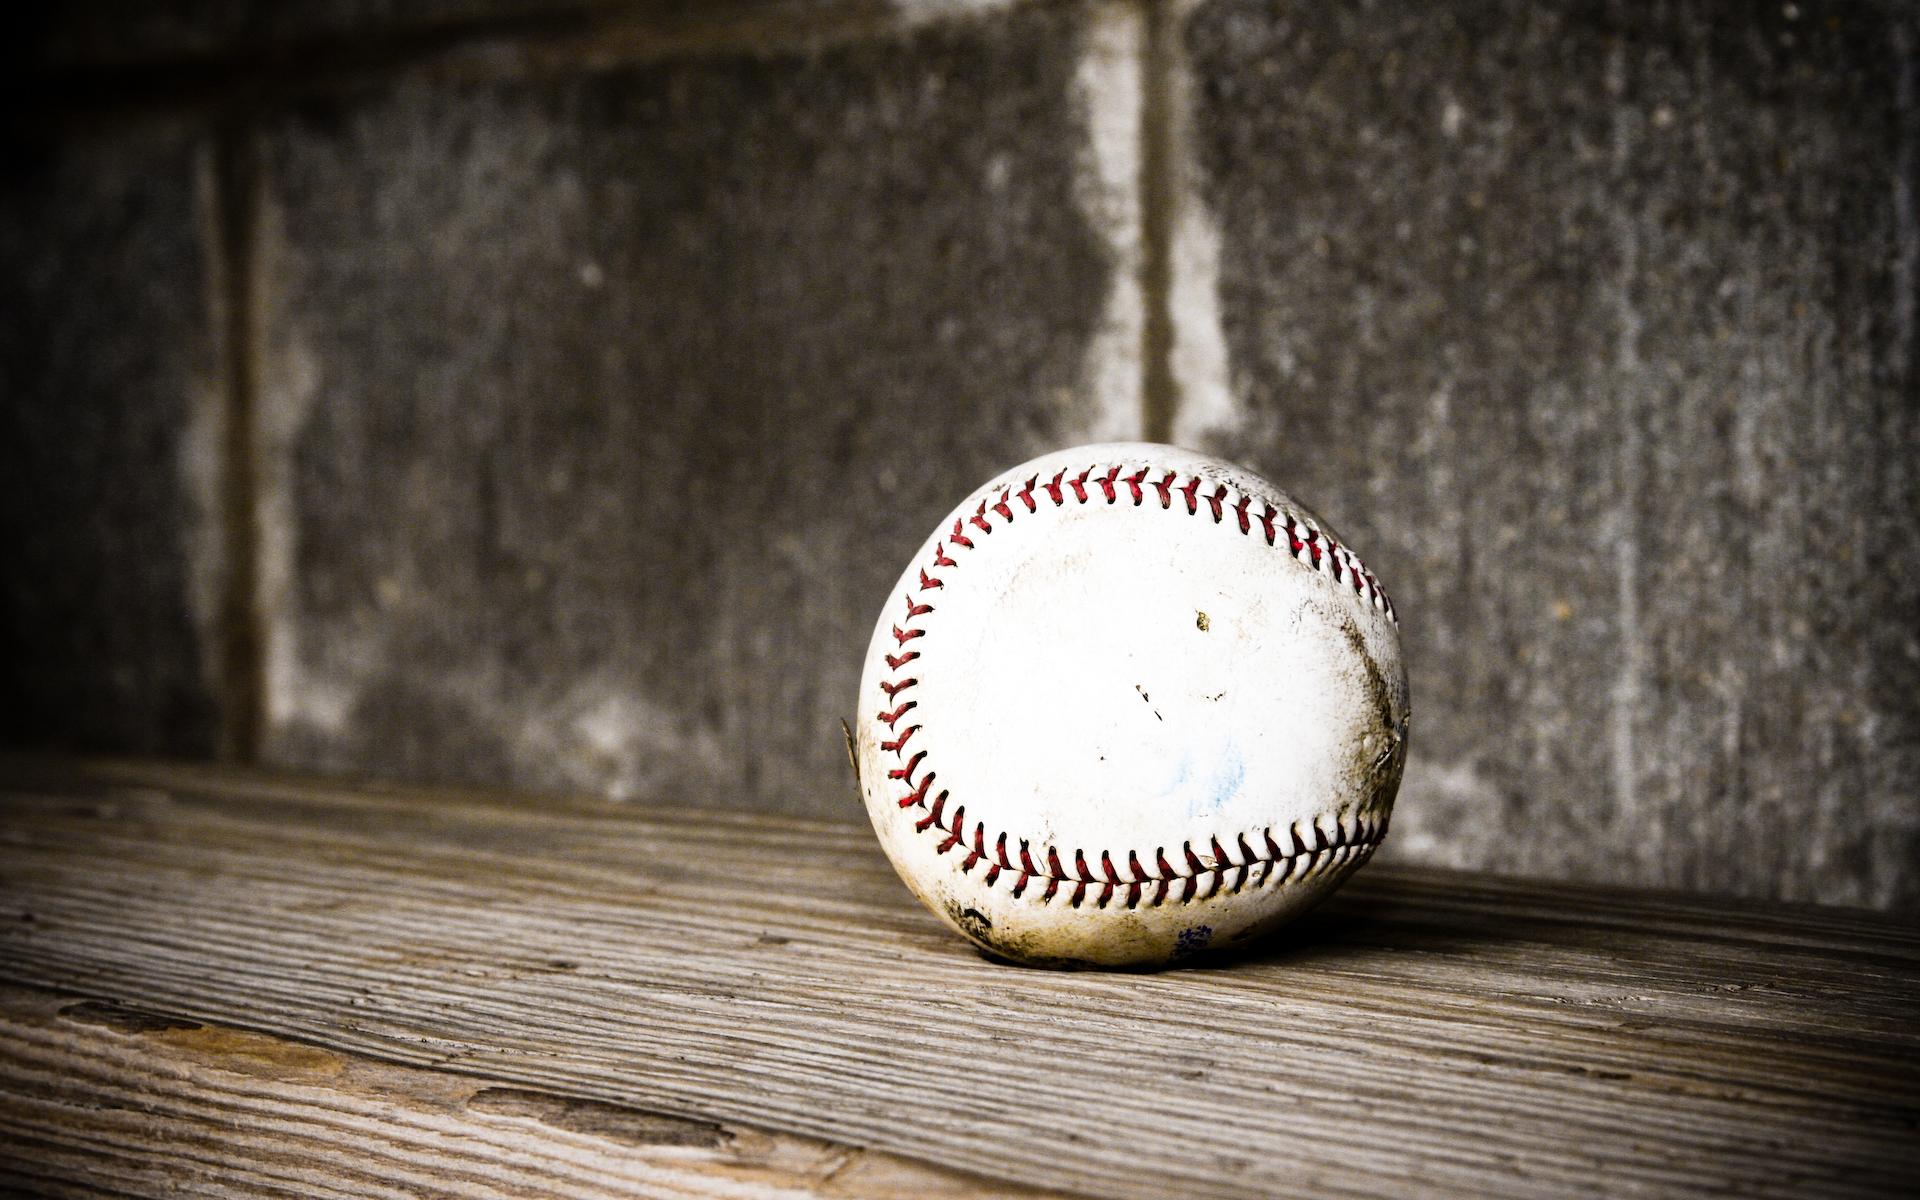 Baseball Wallpaper 1920x1200